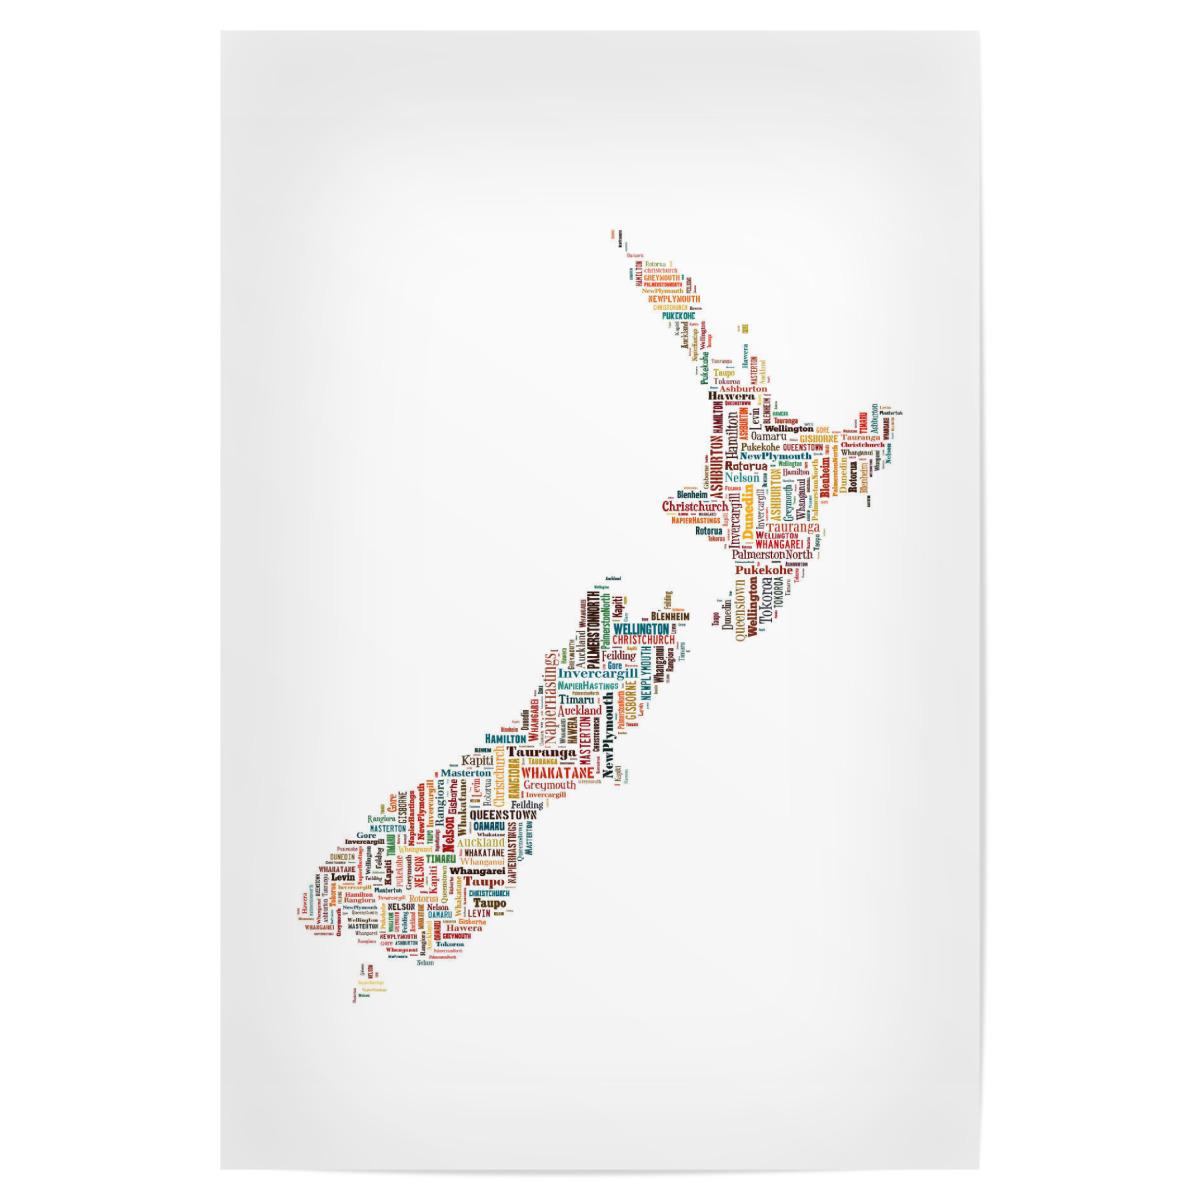 New Zealand Map Black als Poster bei artboxONE kaufen